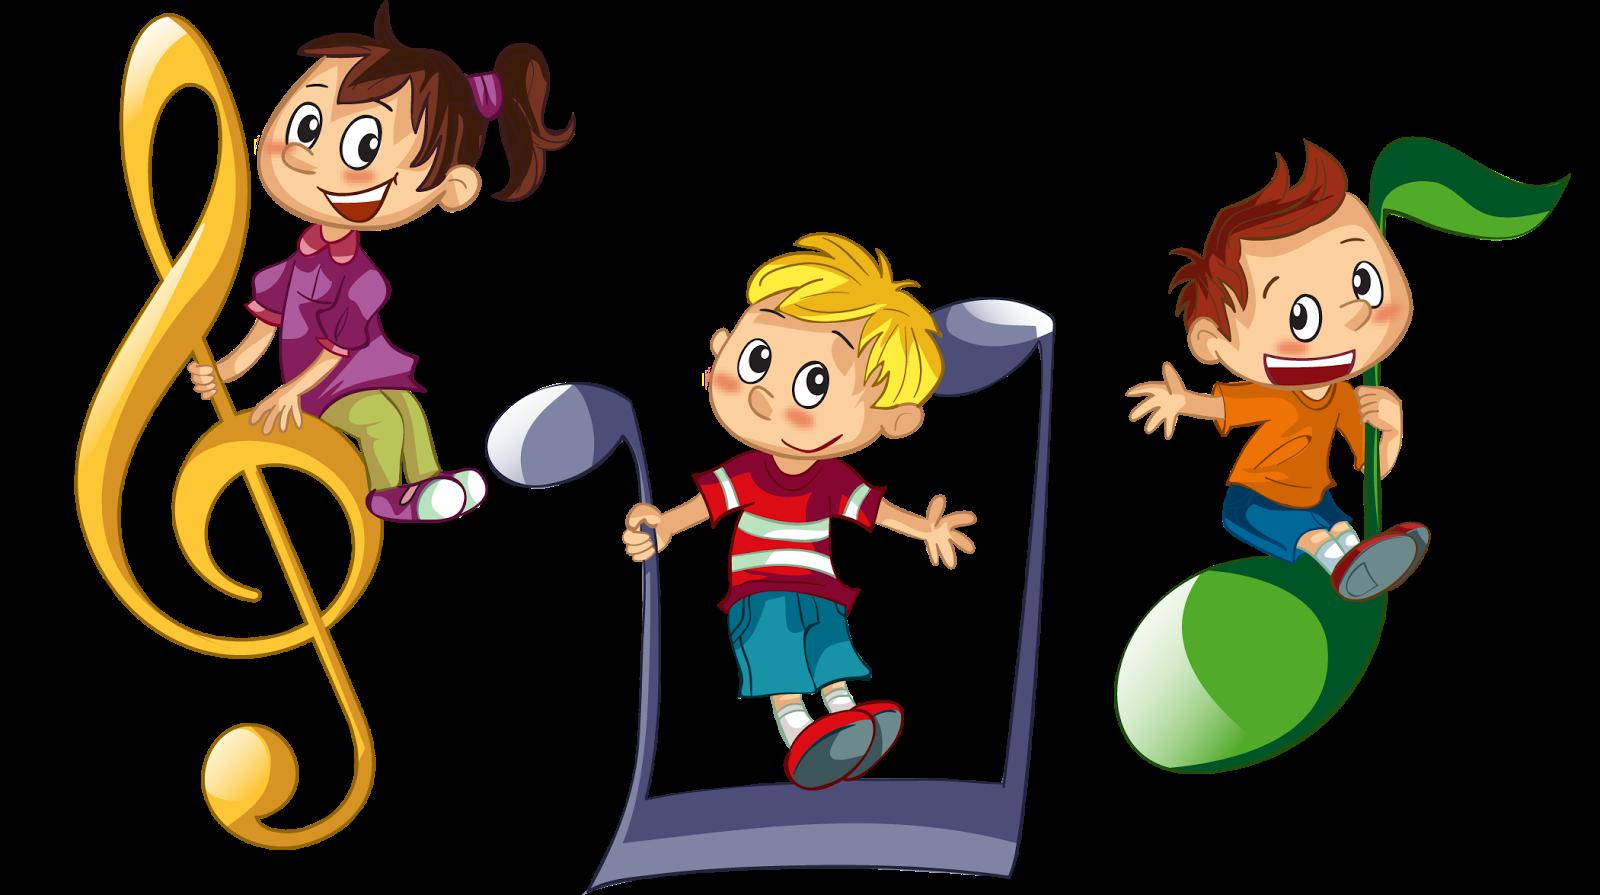 Занятия картинки для детей на прозрачном фоне